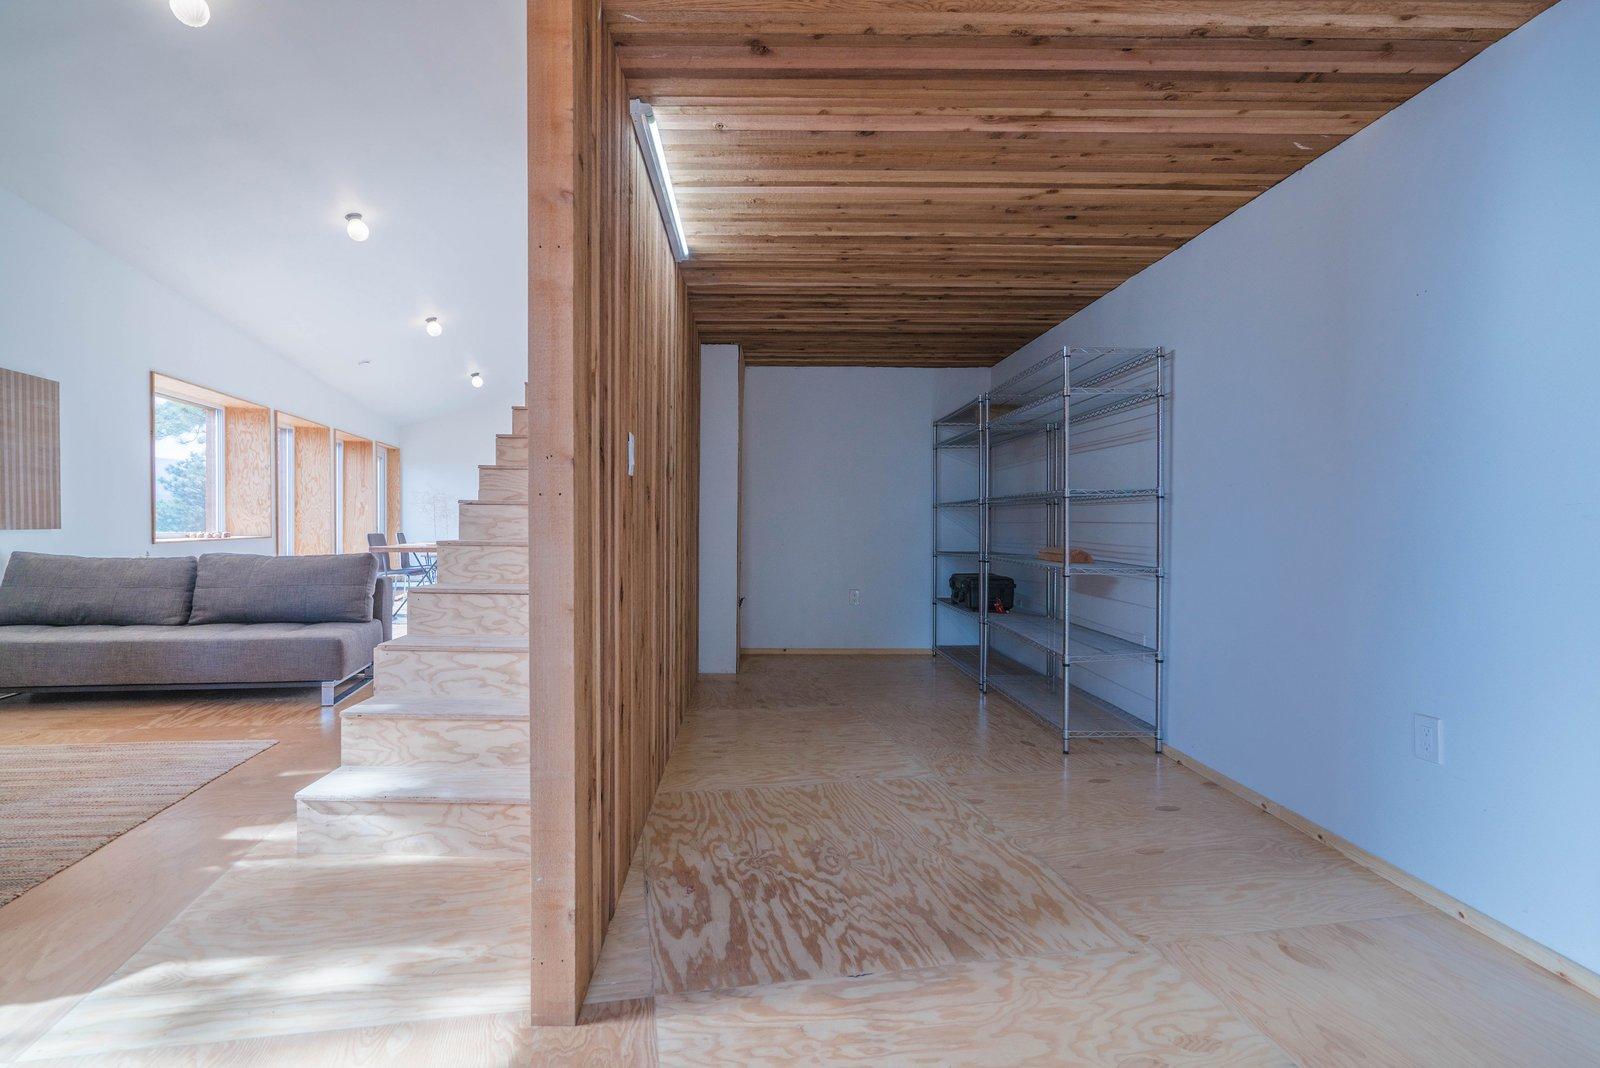 Tagged: Study, Light Hardwood Floor, Storage Room, and Shelves Storage Type.  MARTaK Passive House by Baosol Design